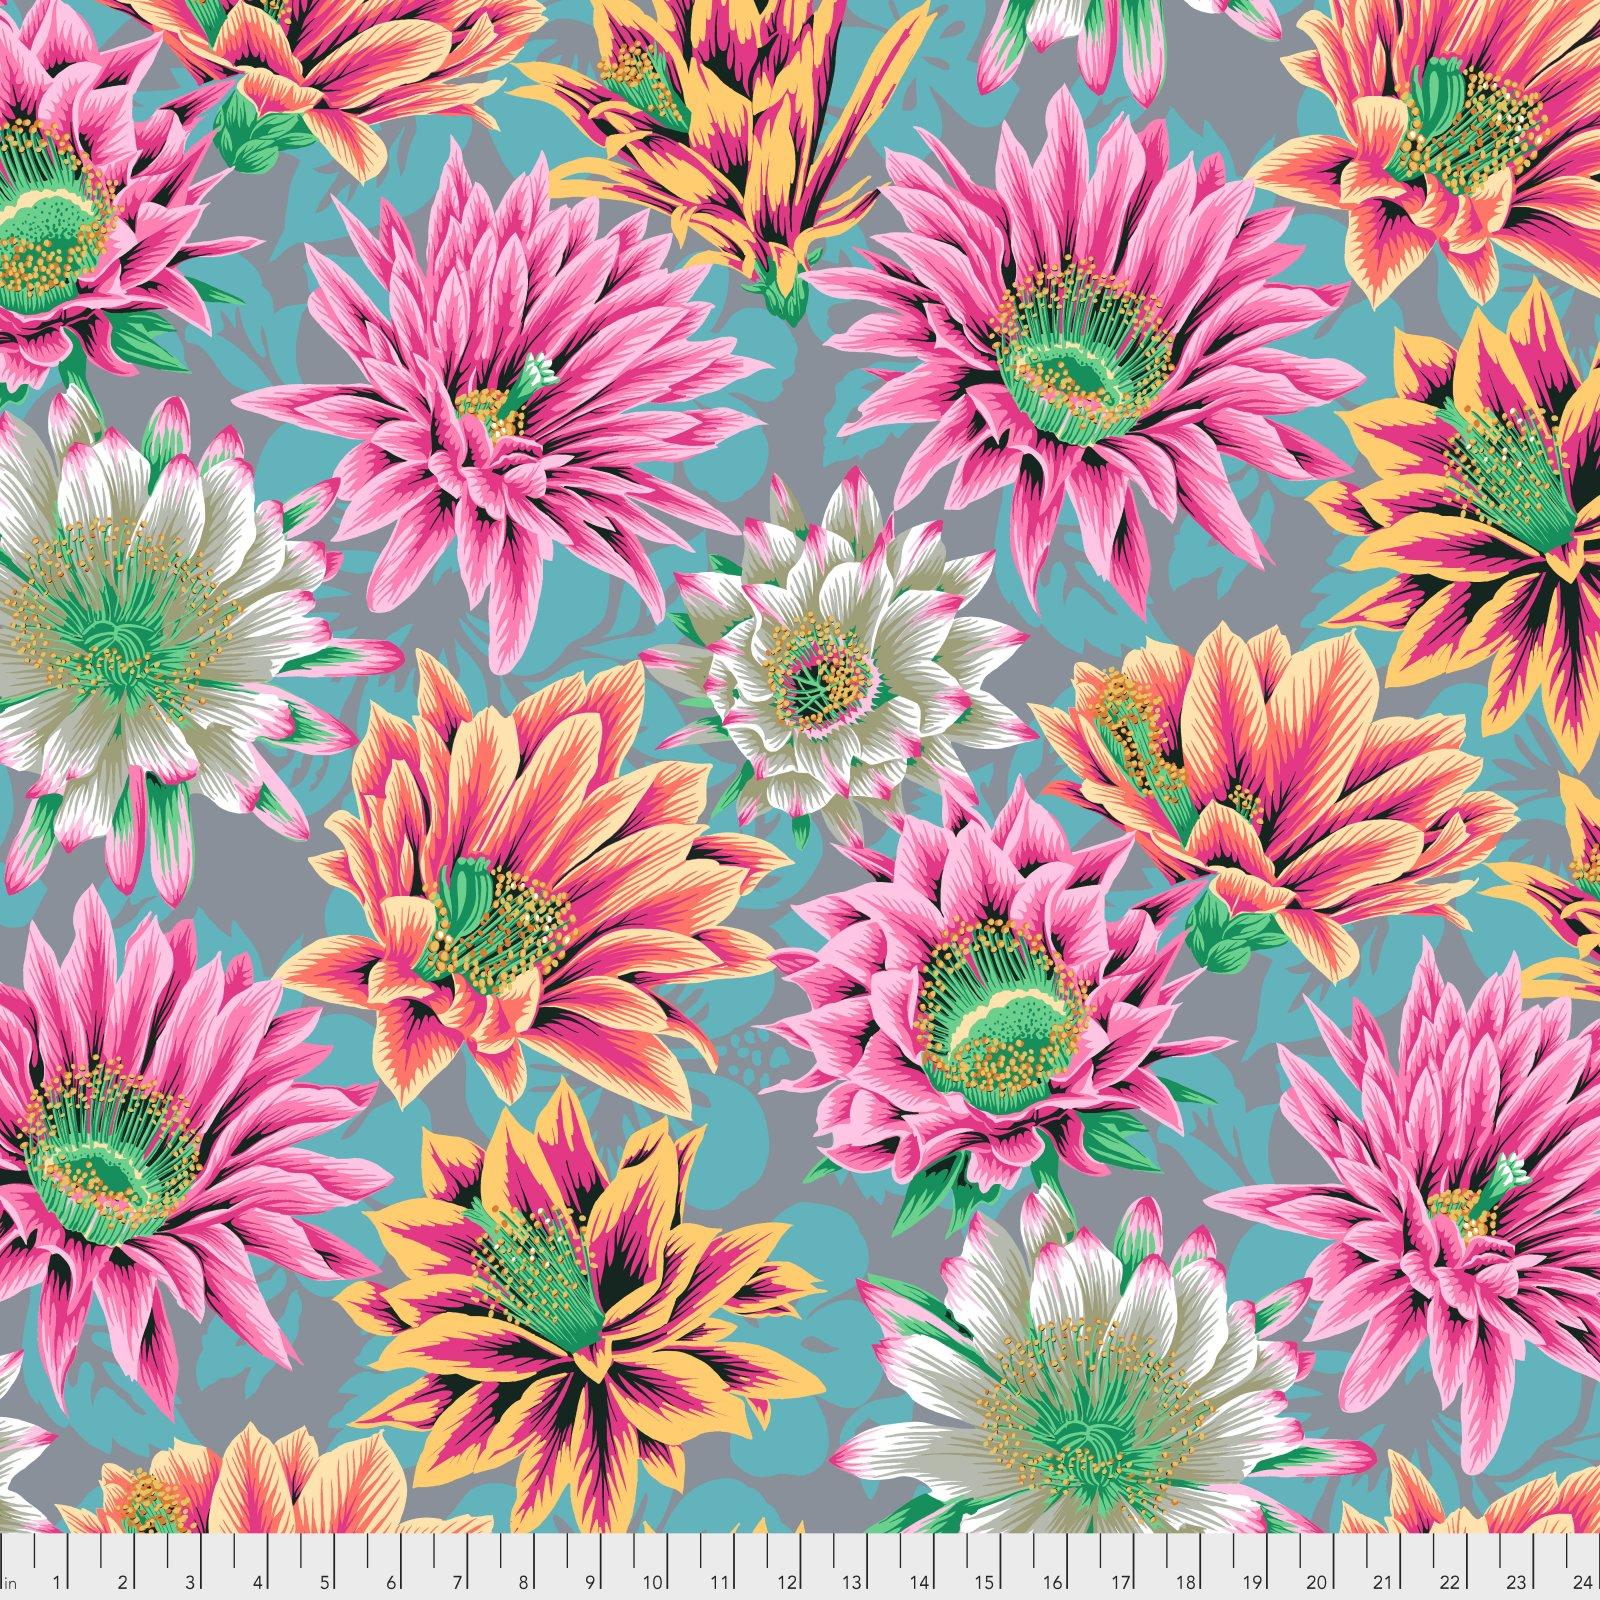 PWPJ096.TAWNY - Cactus Flower